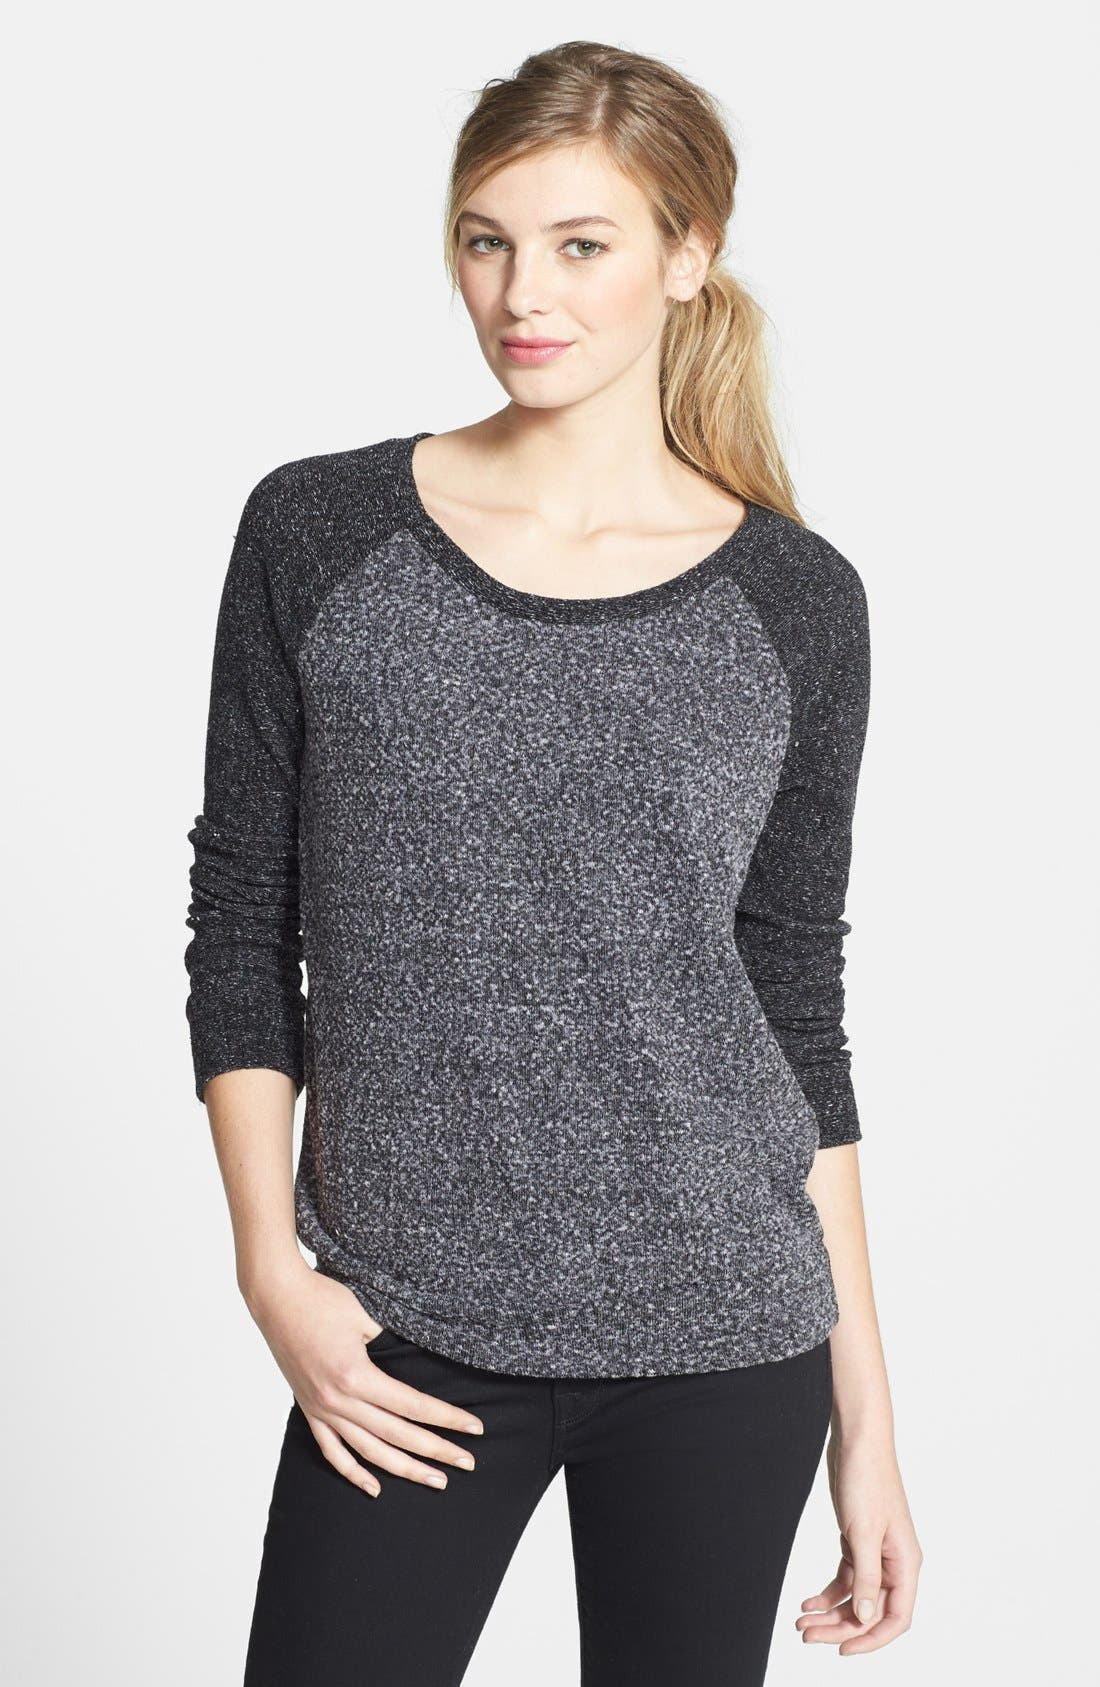 Alternate Image 1 Selected - Halogen® Raglan Sleeve Mélange Knit Top (Regular & Petite)